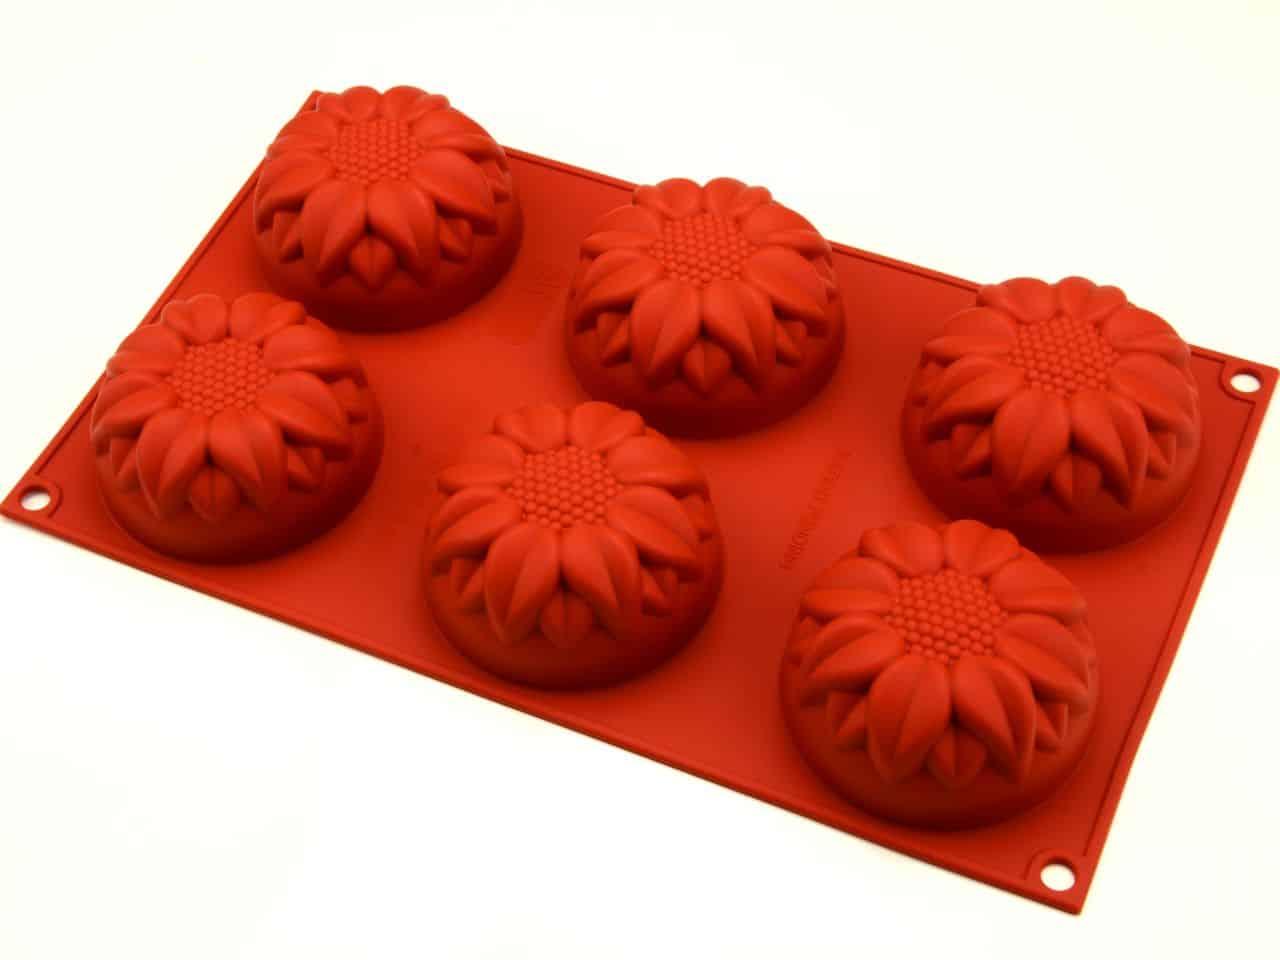 Silikonform Mini Sonnenblume V01